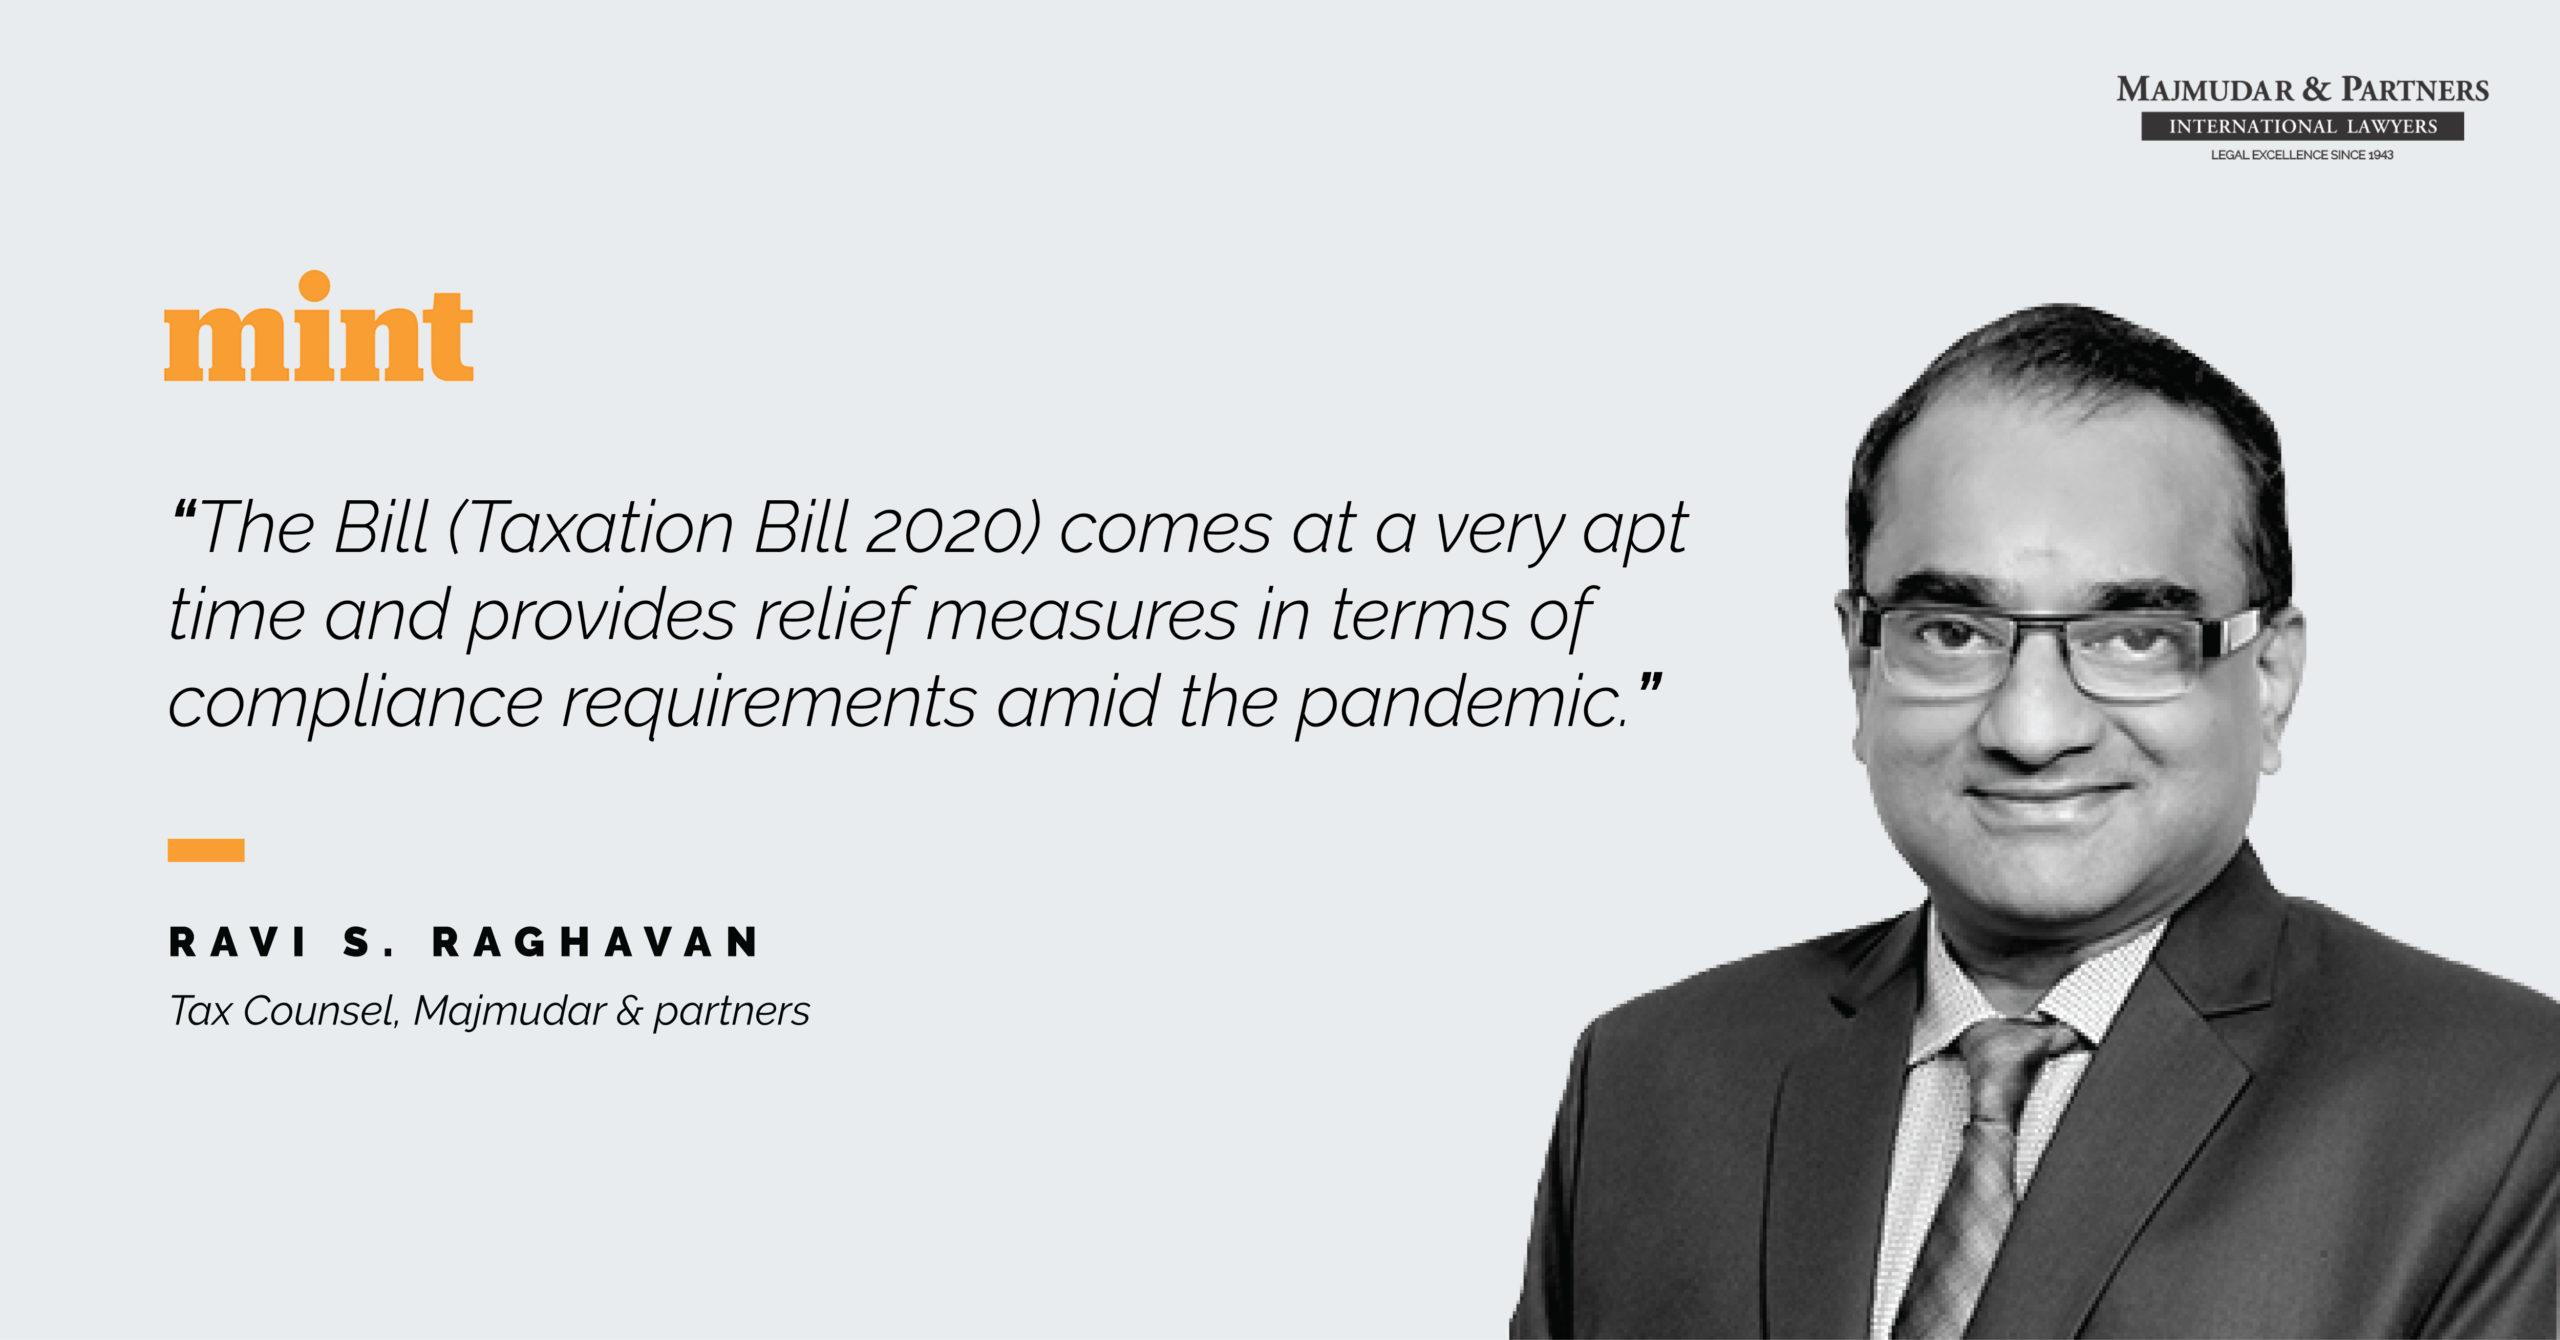 Ravi S. Raghavan speaks to Livemint about Taxation Bill 2020